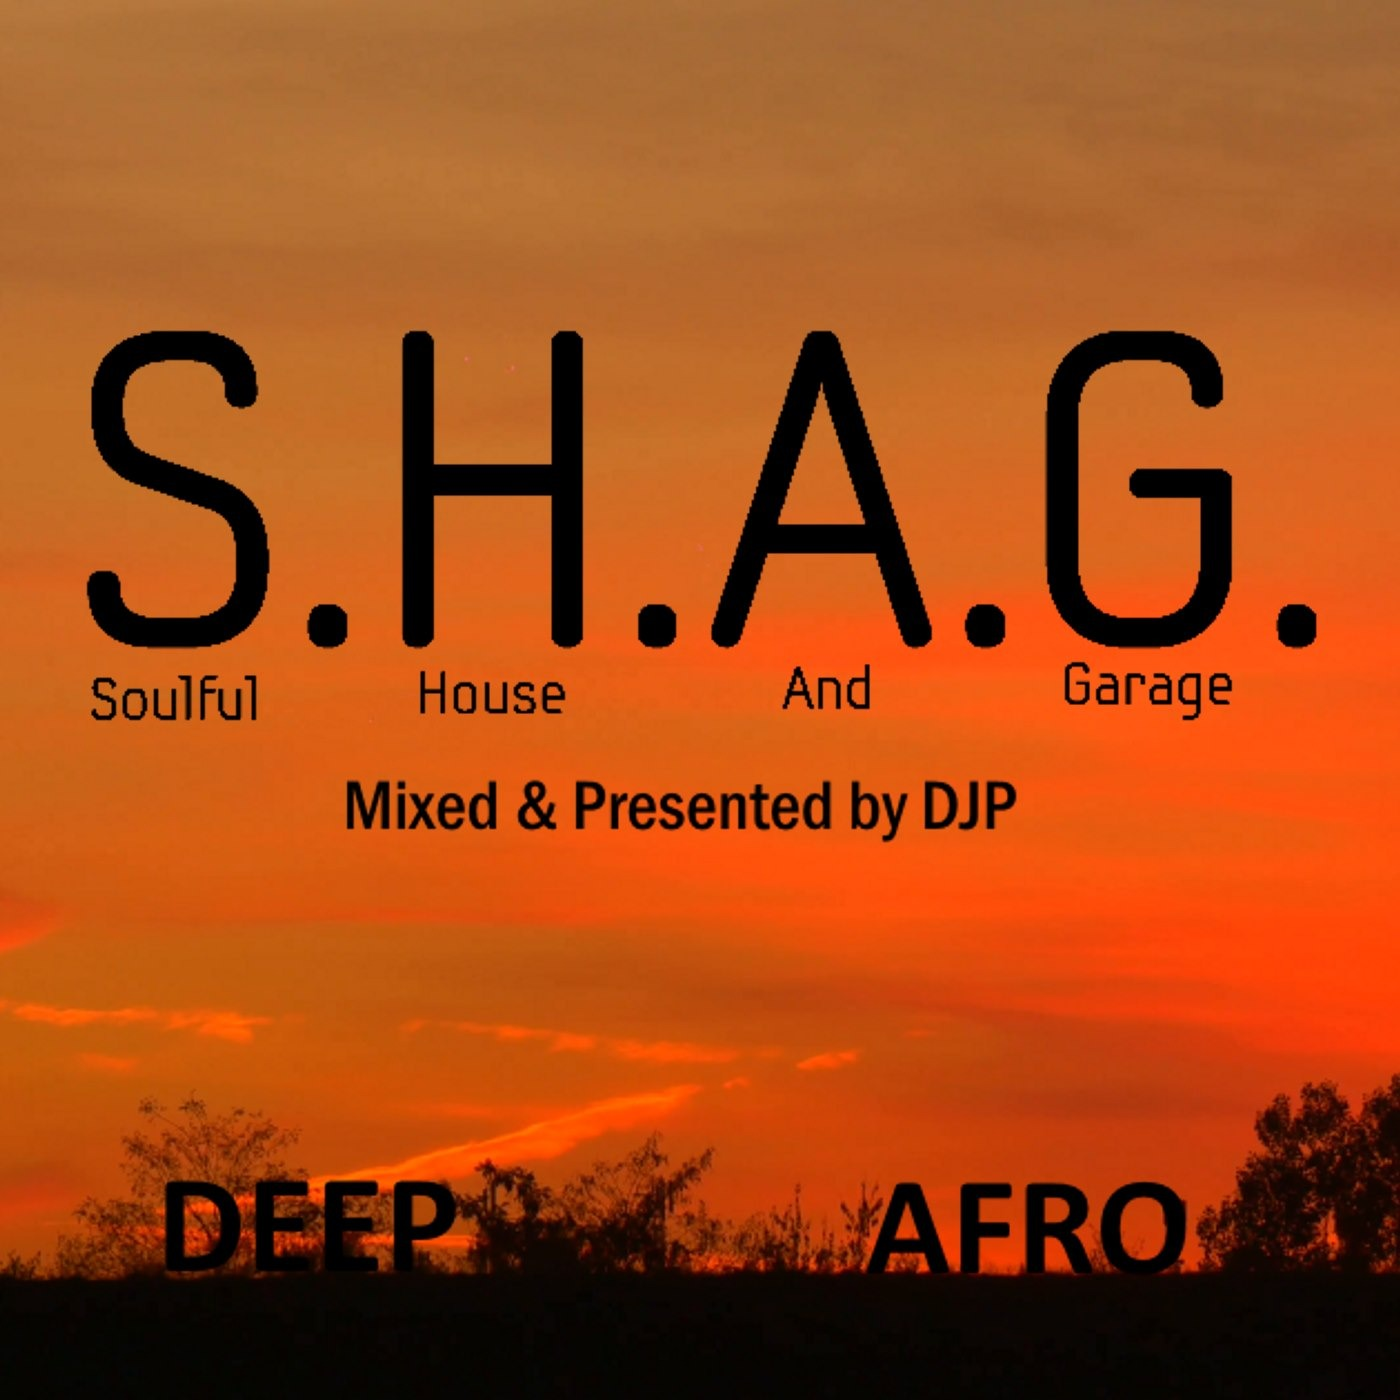 DJP SHAG 8-oct-18 DEEP AFRO HOUSE MIX DJP's S H A G  Soulful